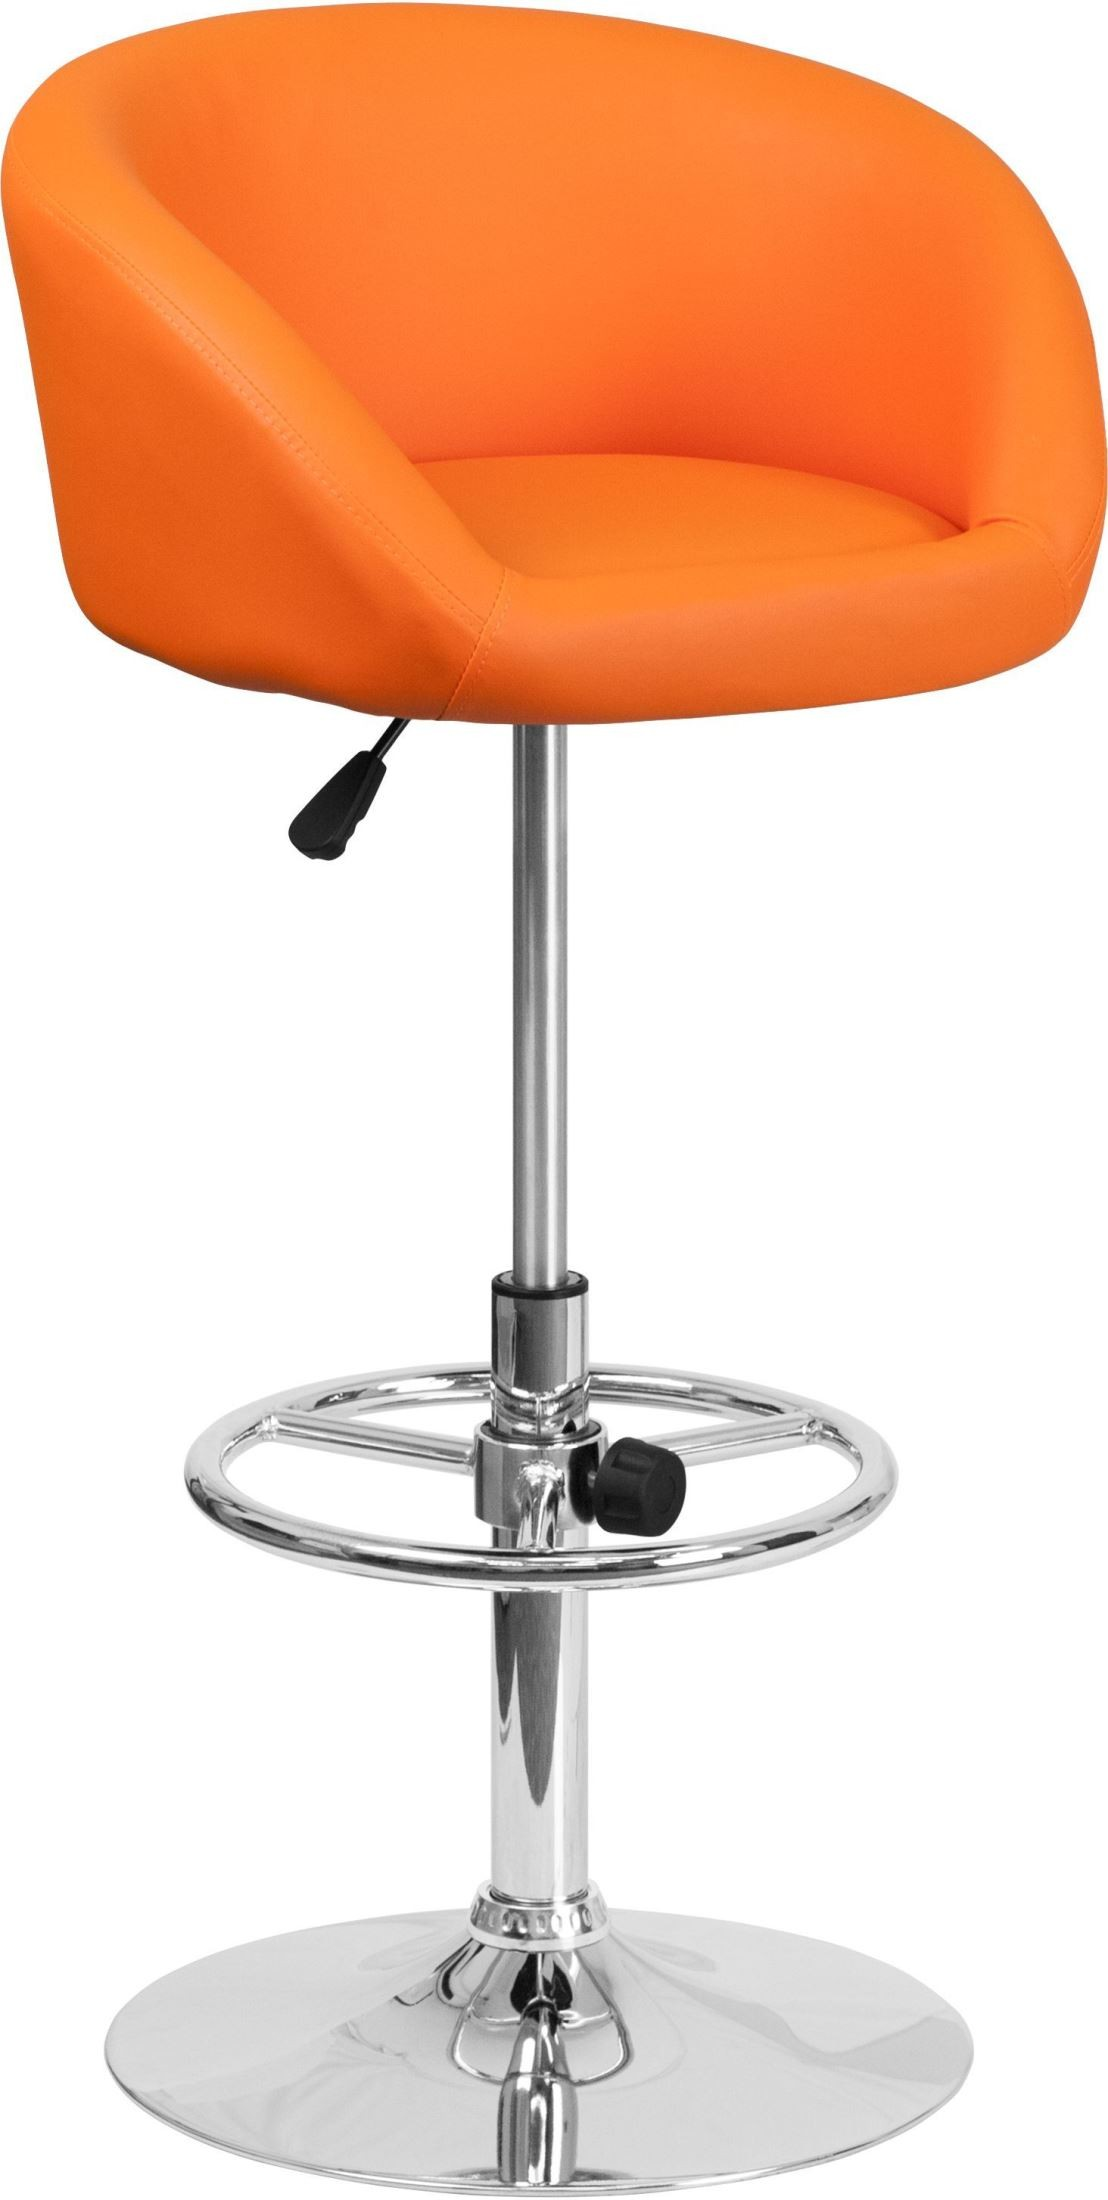 Rounded Swivel Orange Vinyl Adjustable Height Bar Stool